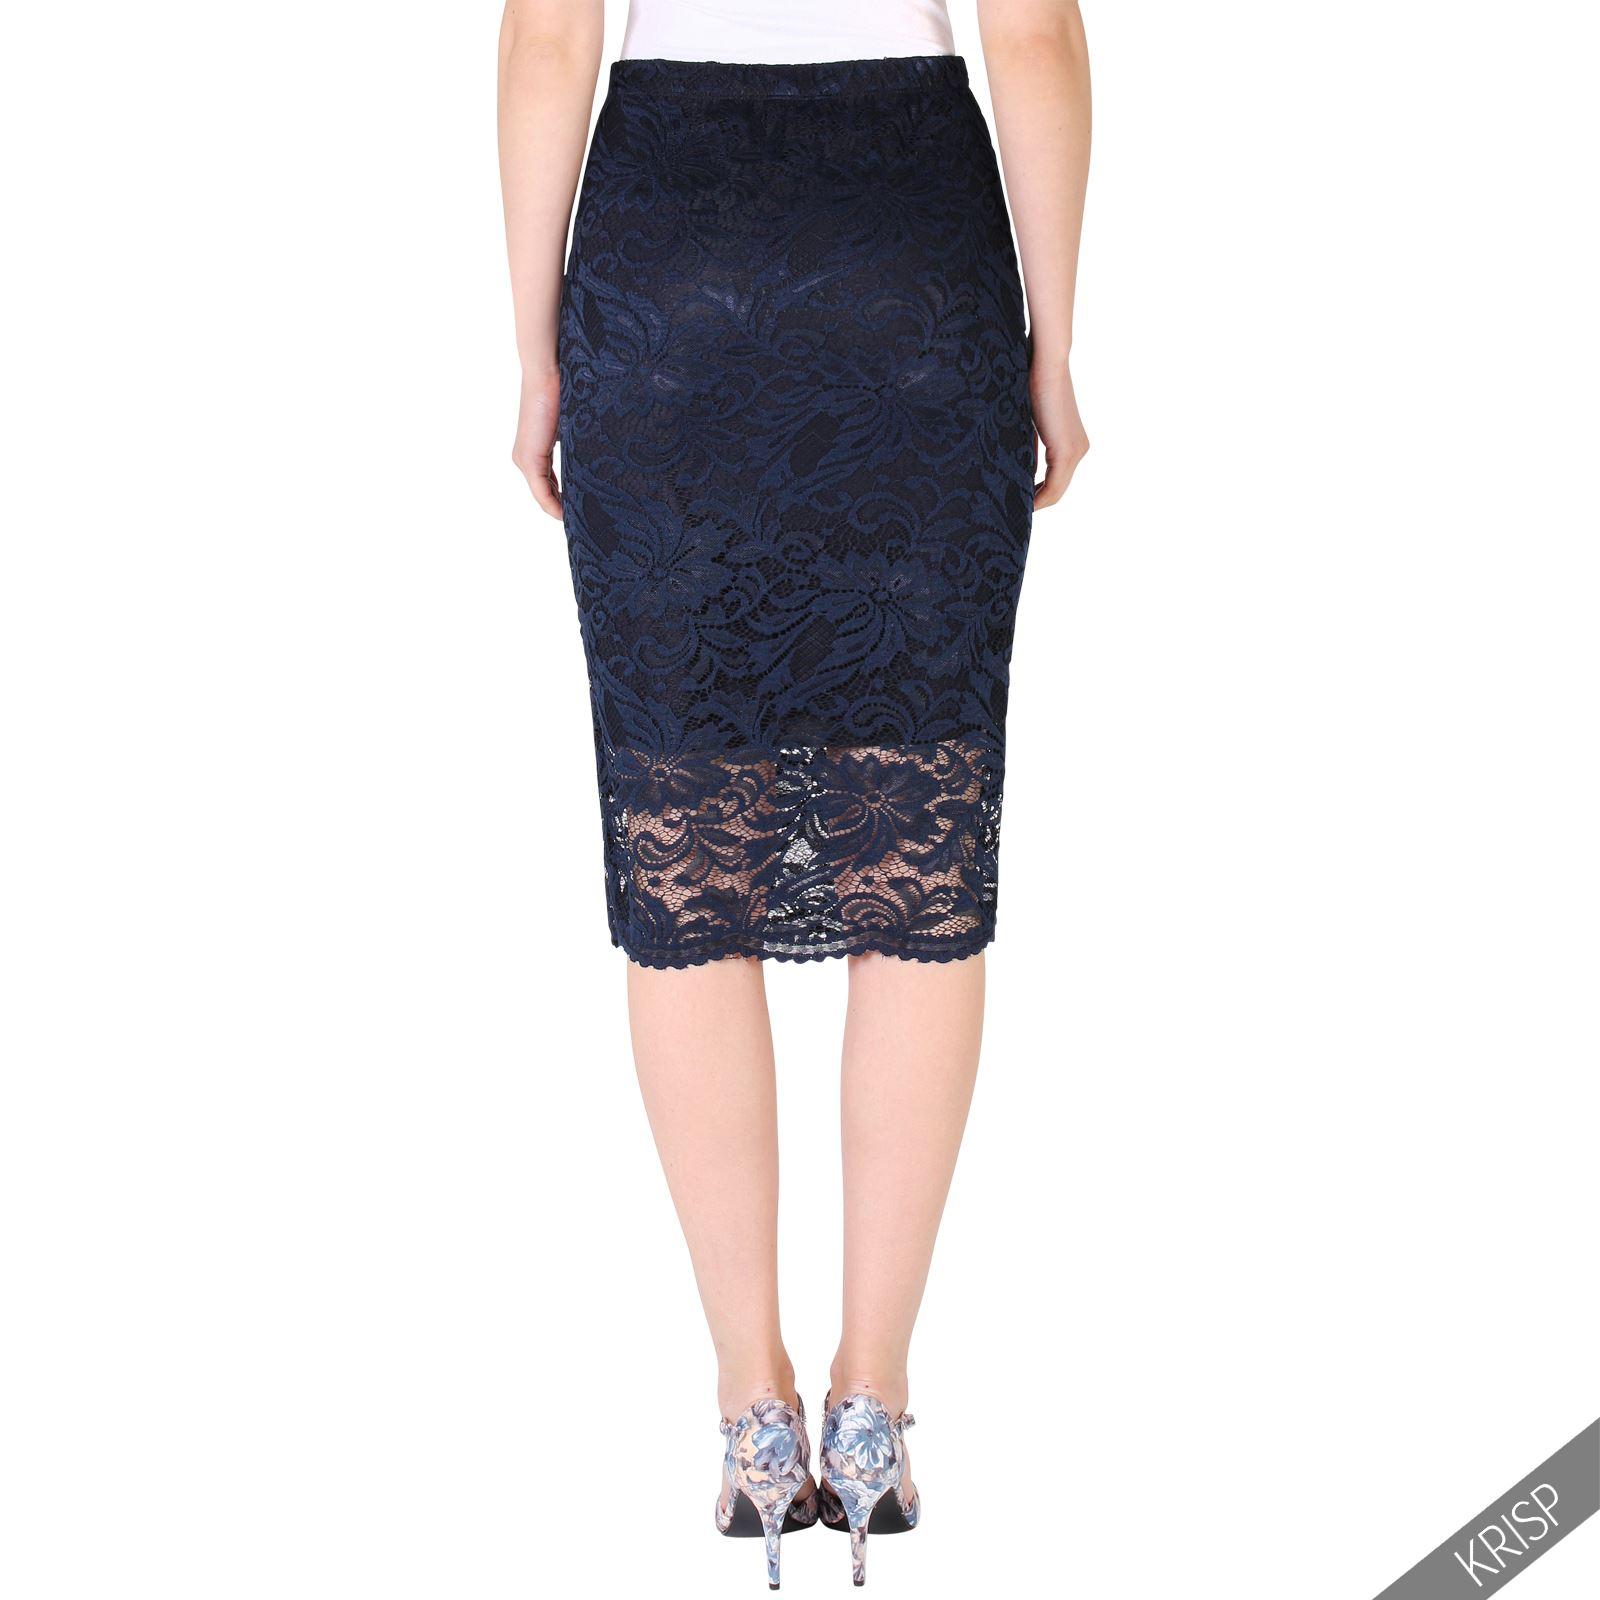 Innovative Theory Skirt Zeyn Pleated Veneza Lace For Women  Dawoob Women